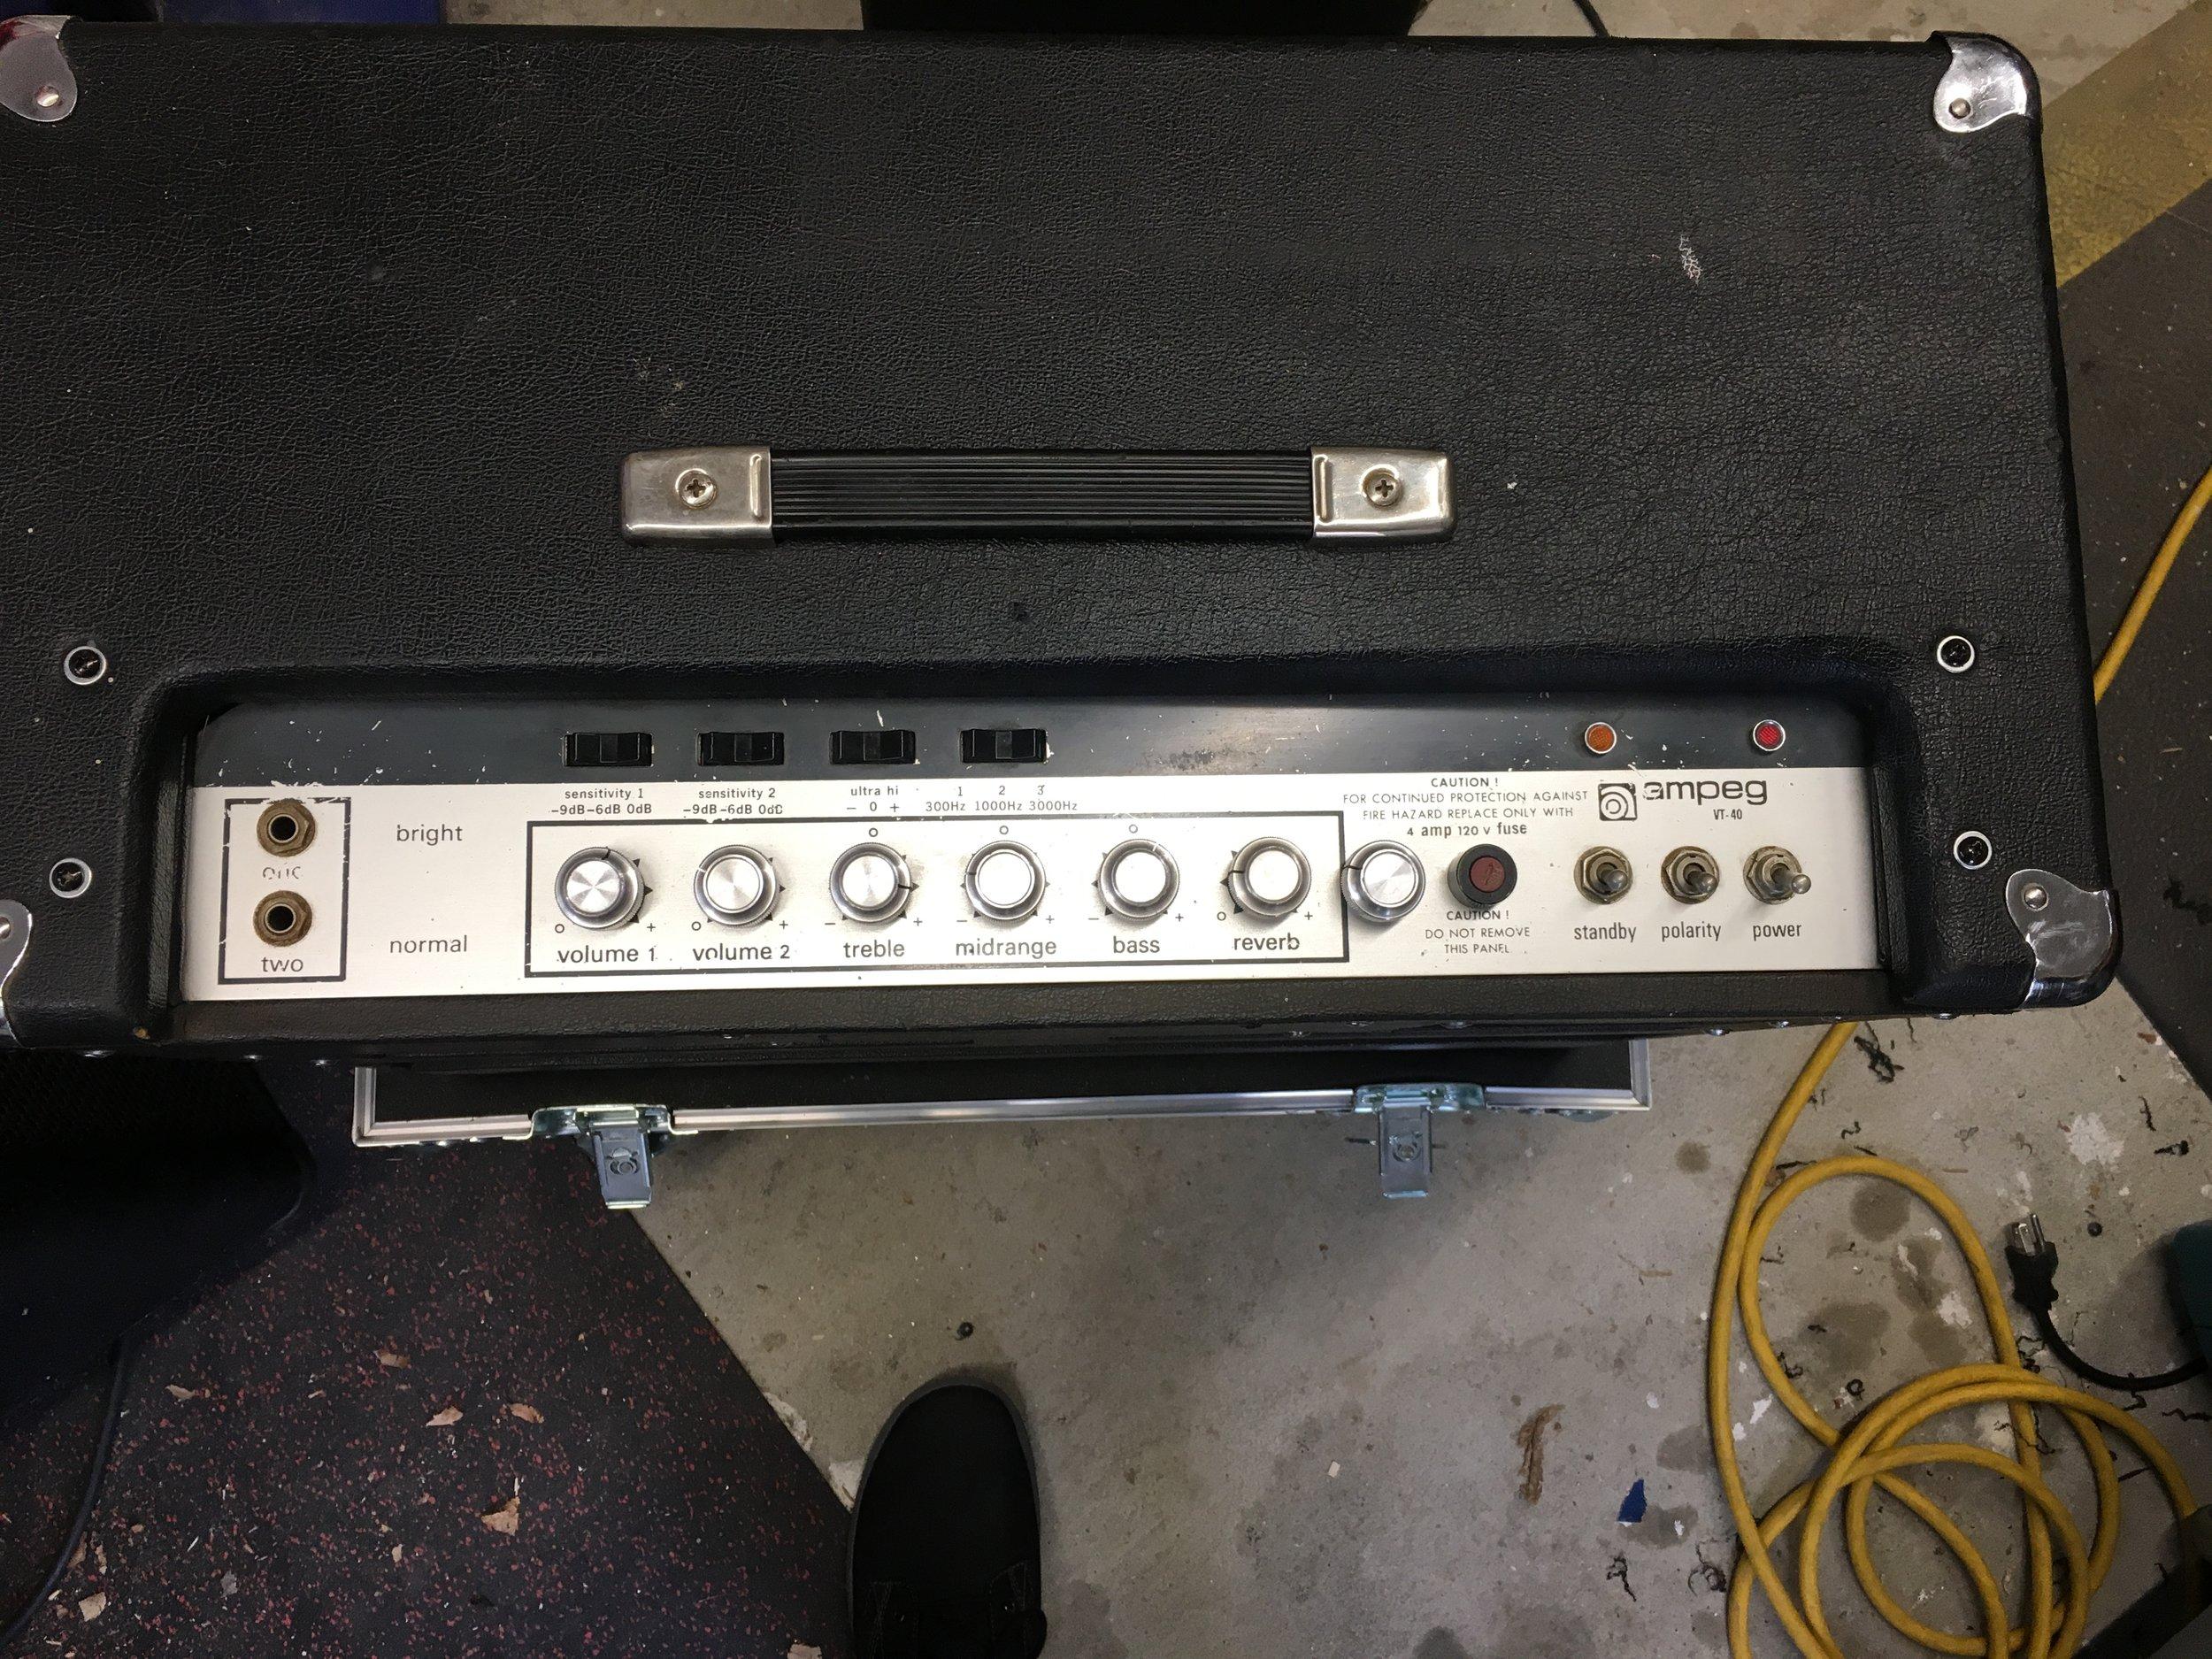 Ampeg VT-40 Top Load